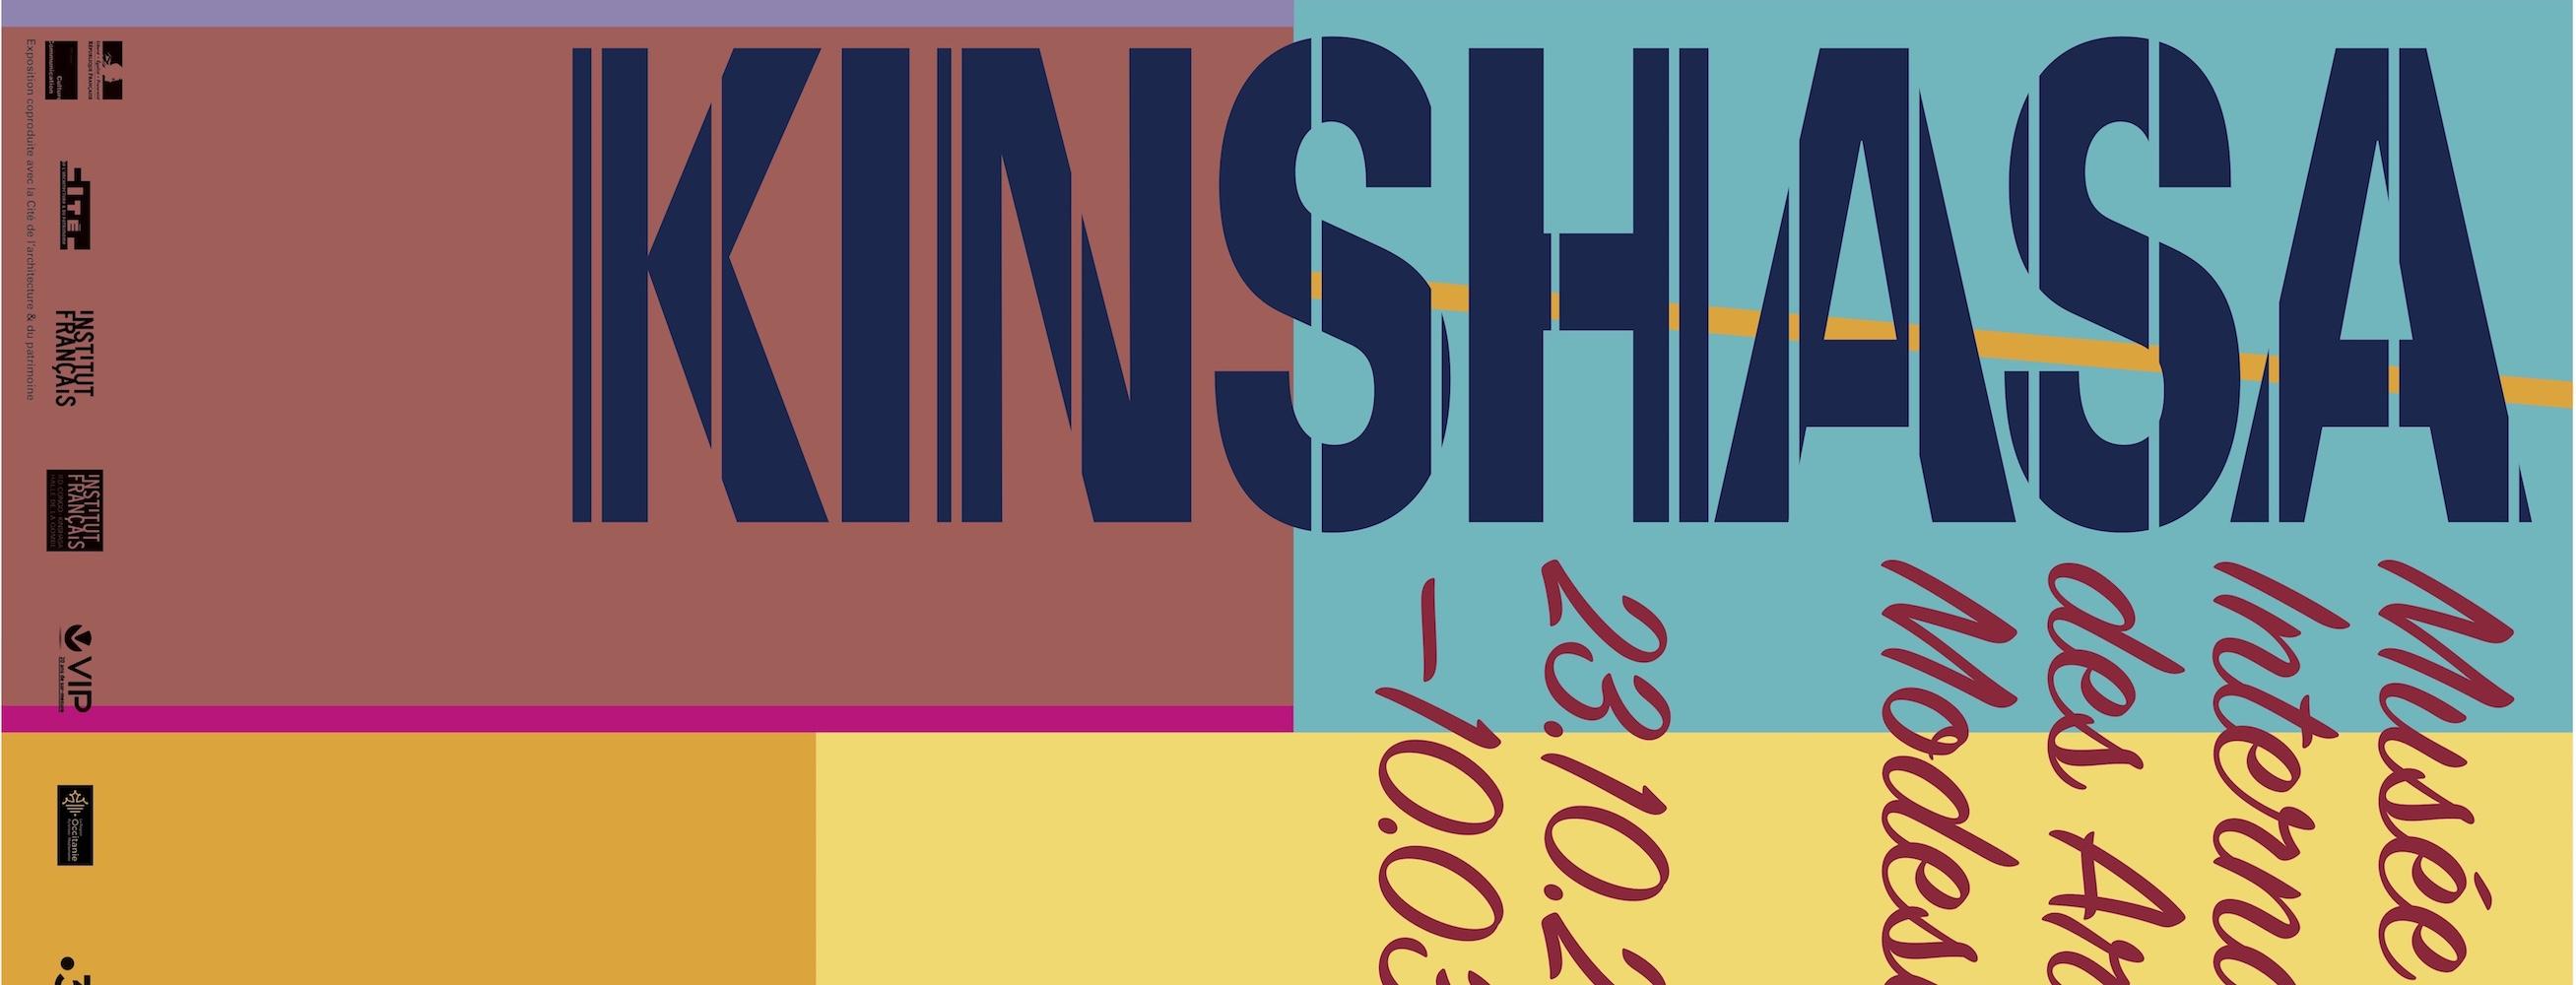 POSTER_09 Kinshasa_def copie4